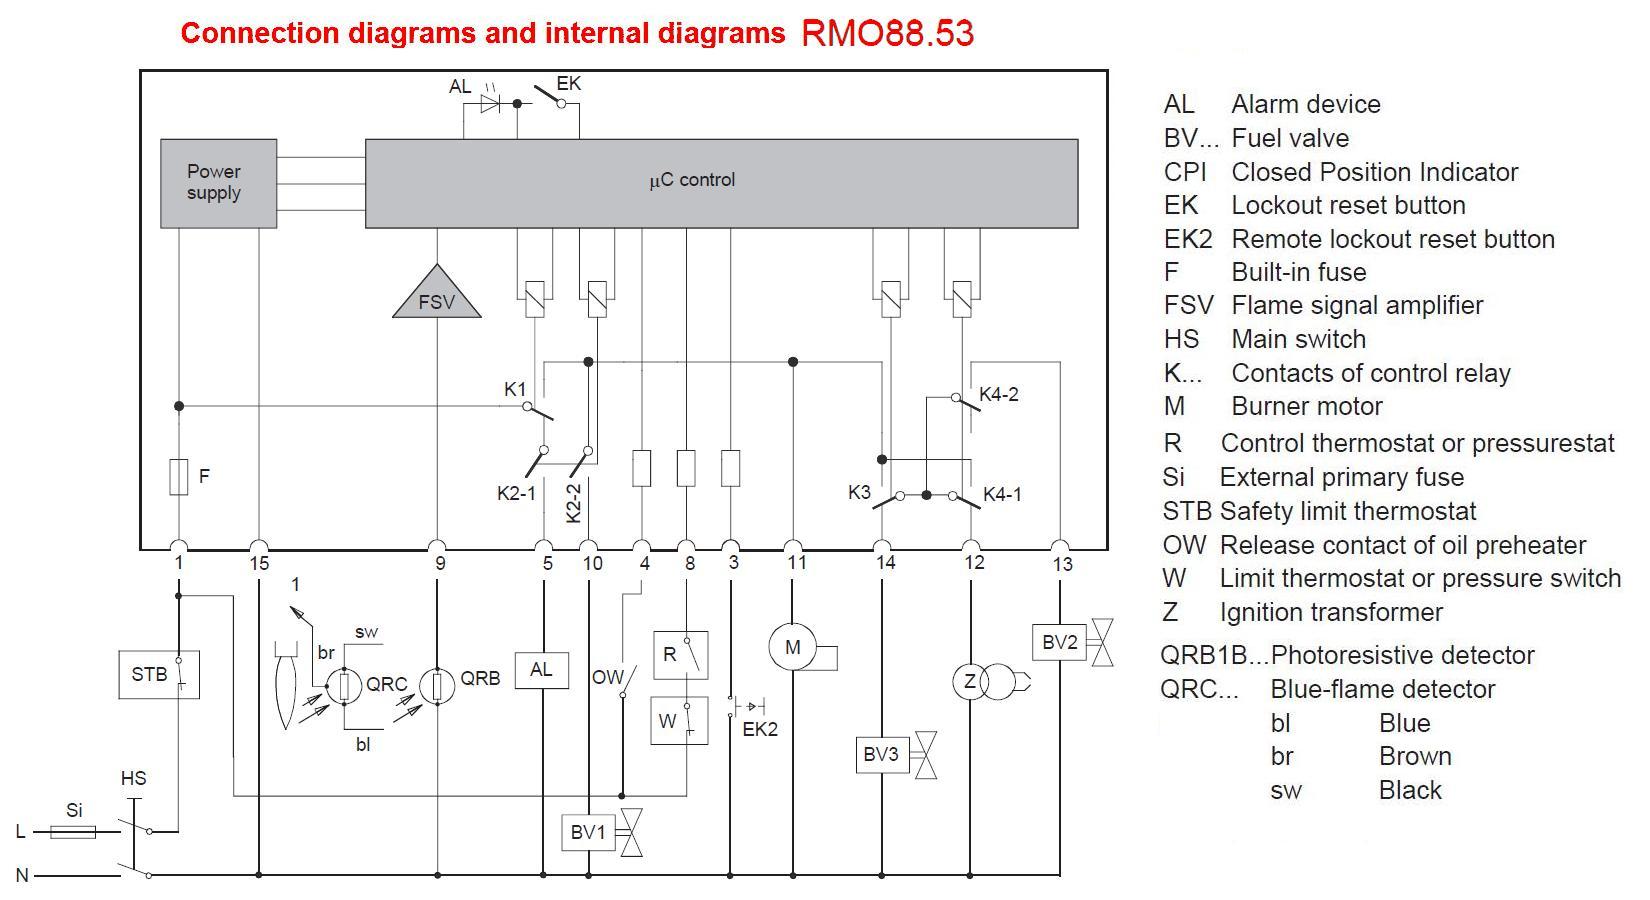 SIEMENS RMO88.53 SCHEMA_ELECTRICA